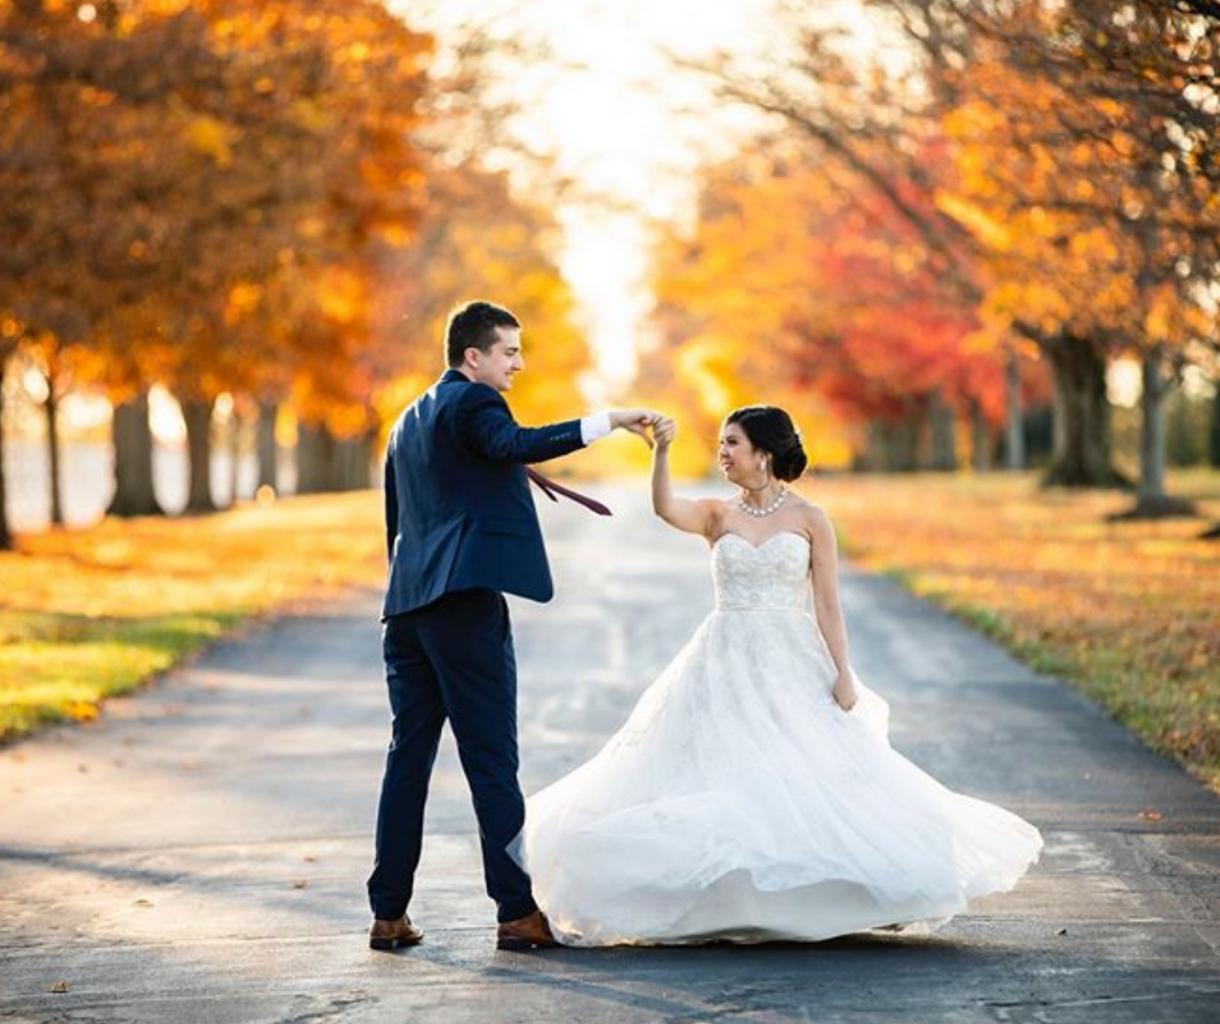 Wedding Day Sneak Peek